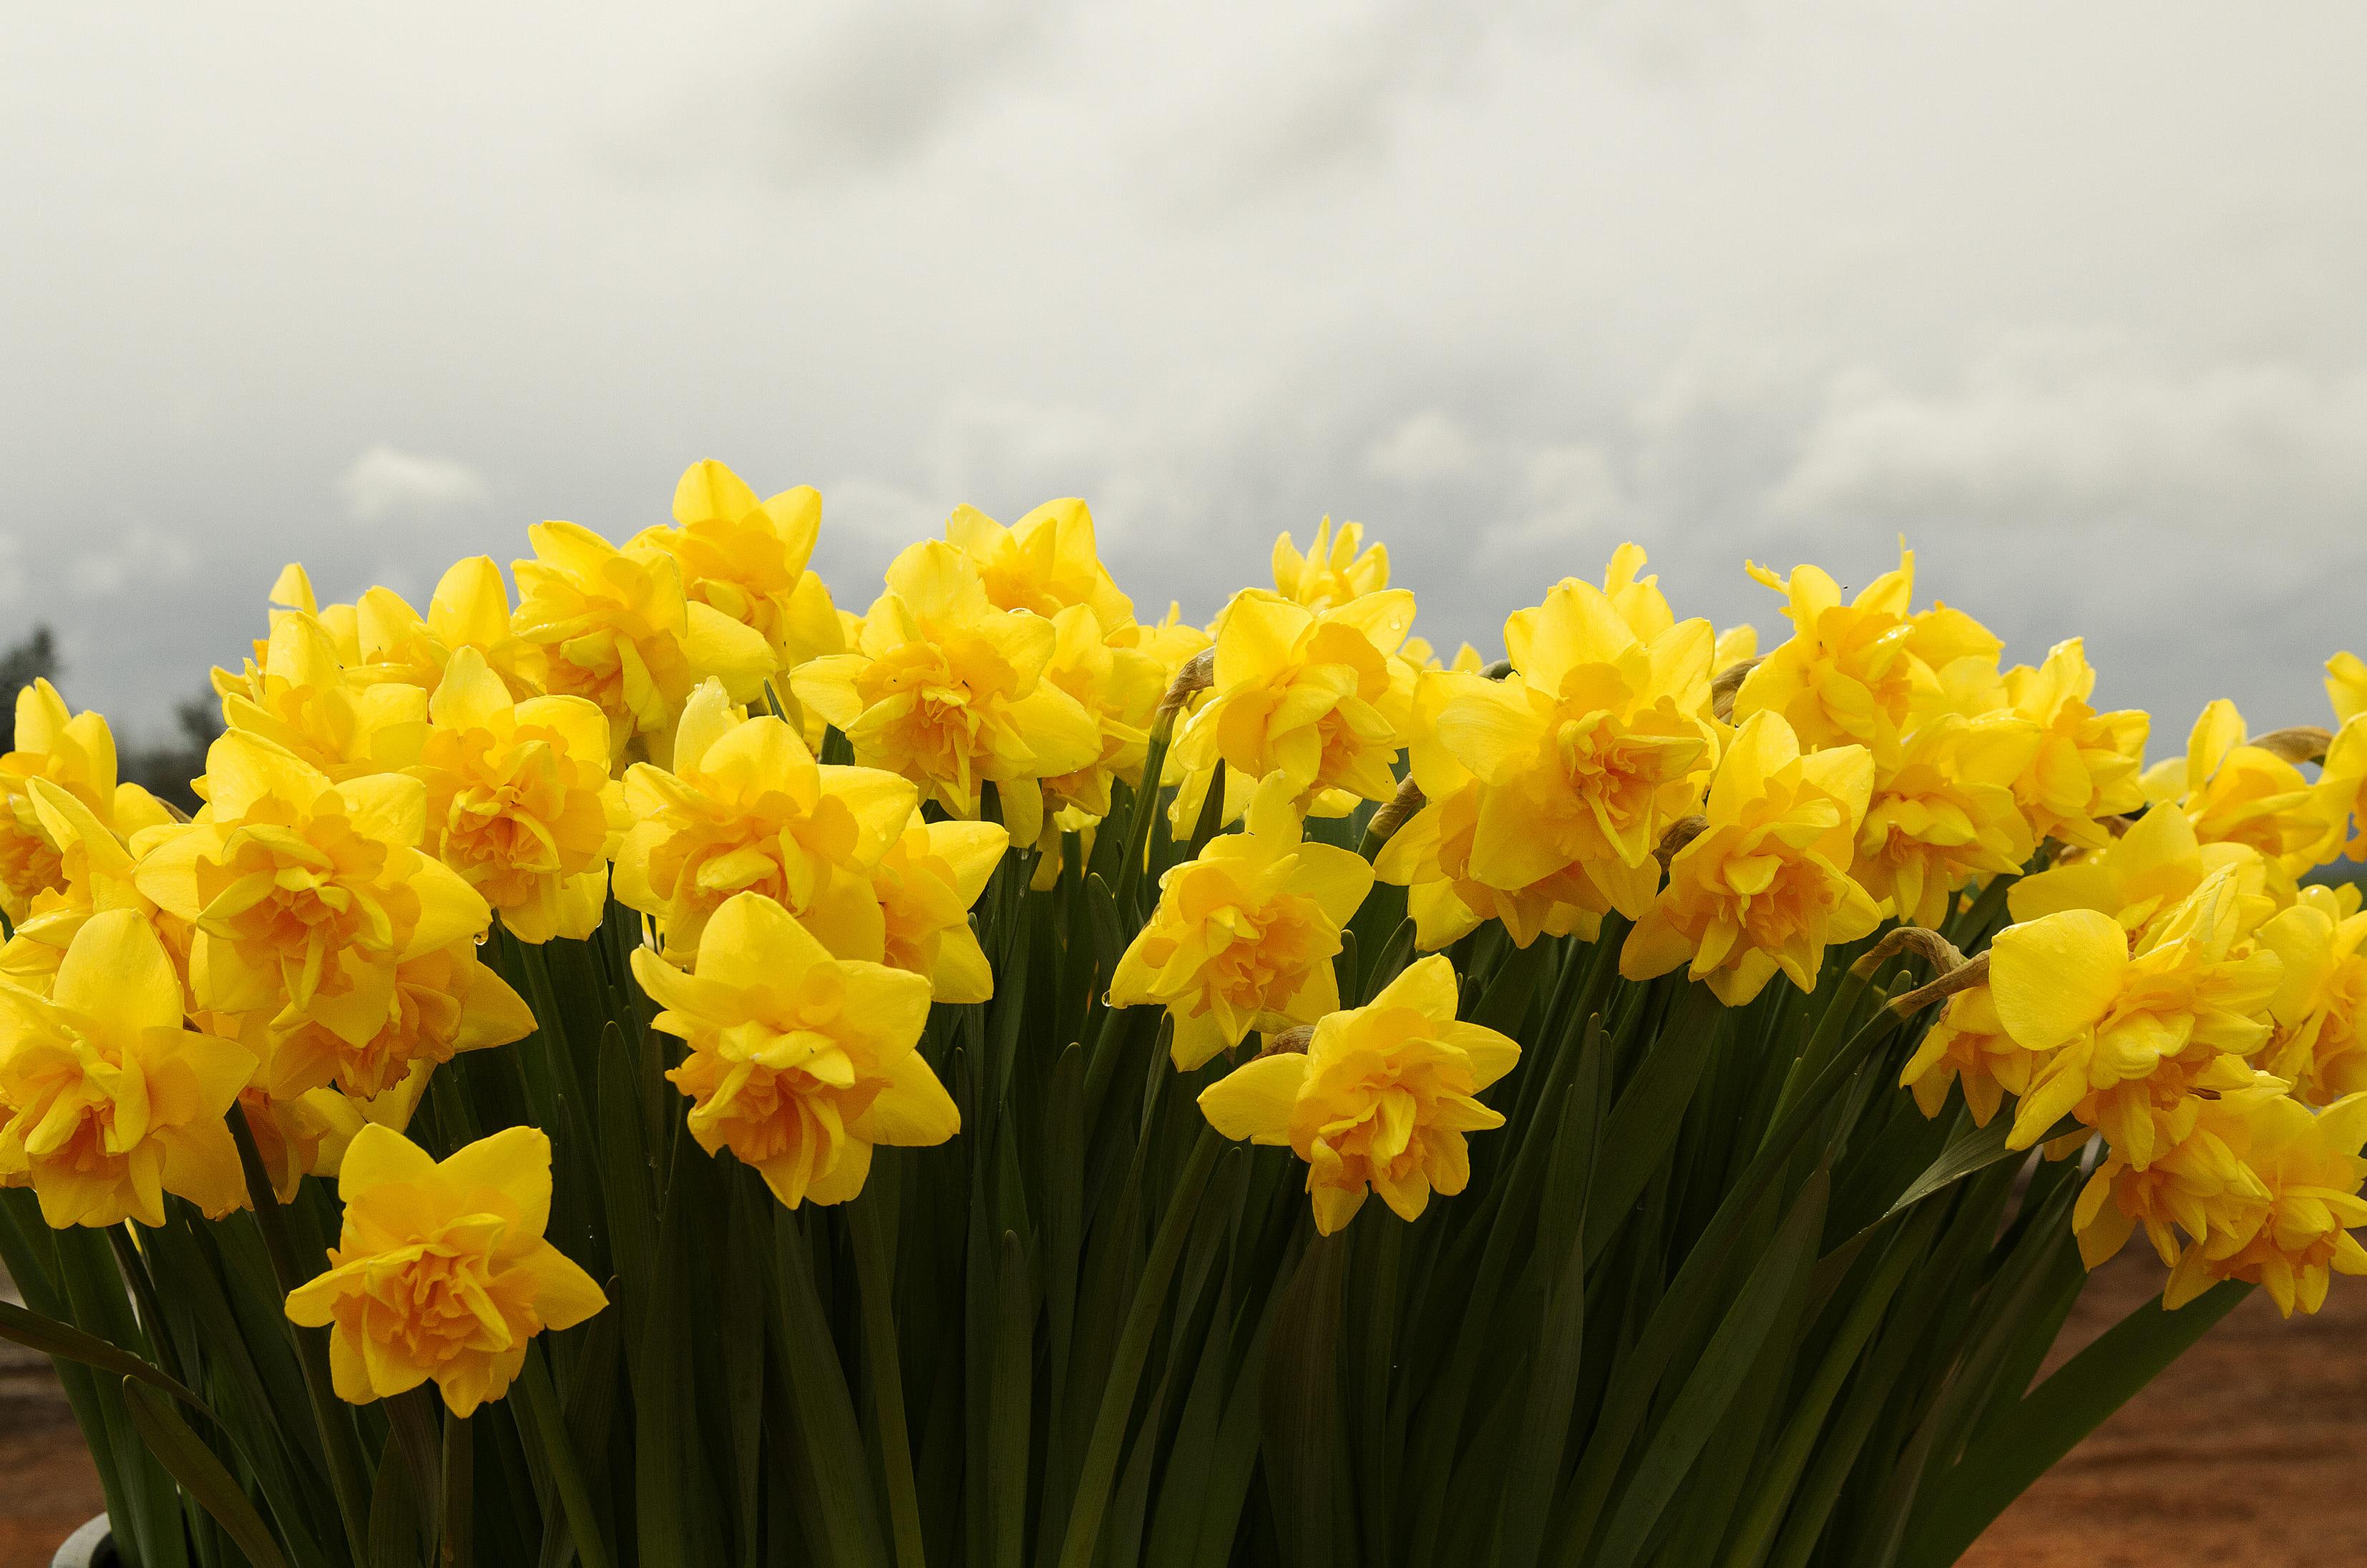 daffodils-photo-62